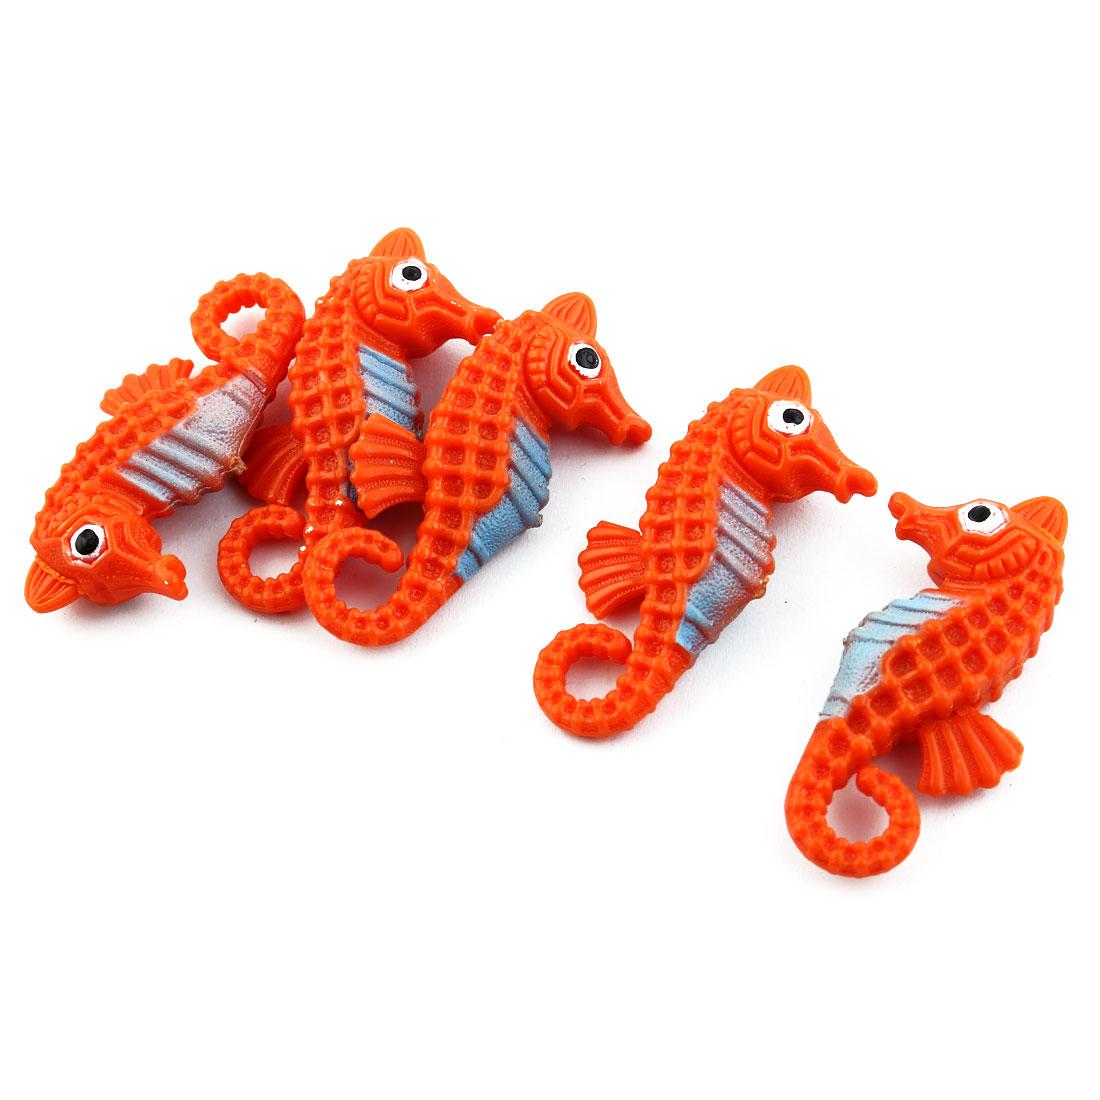 Aquarium Fish Tank Plastic Floating Hippocampi Decorate Ornament Orange 5pcs